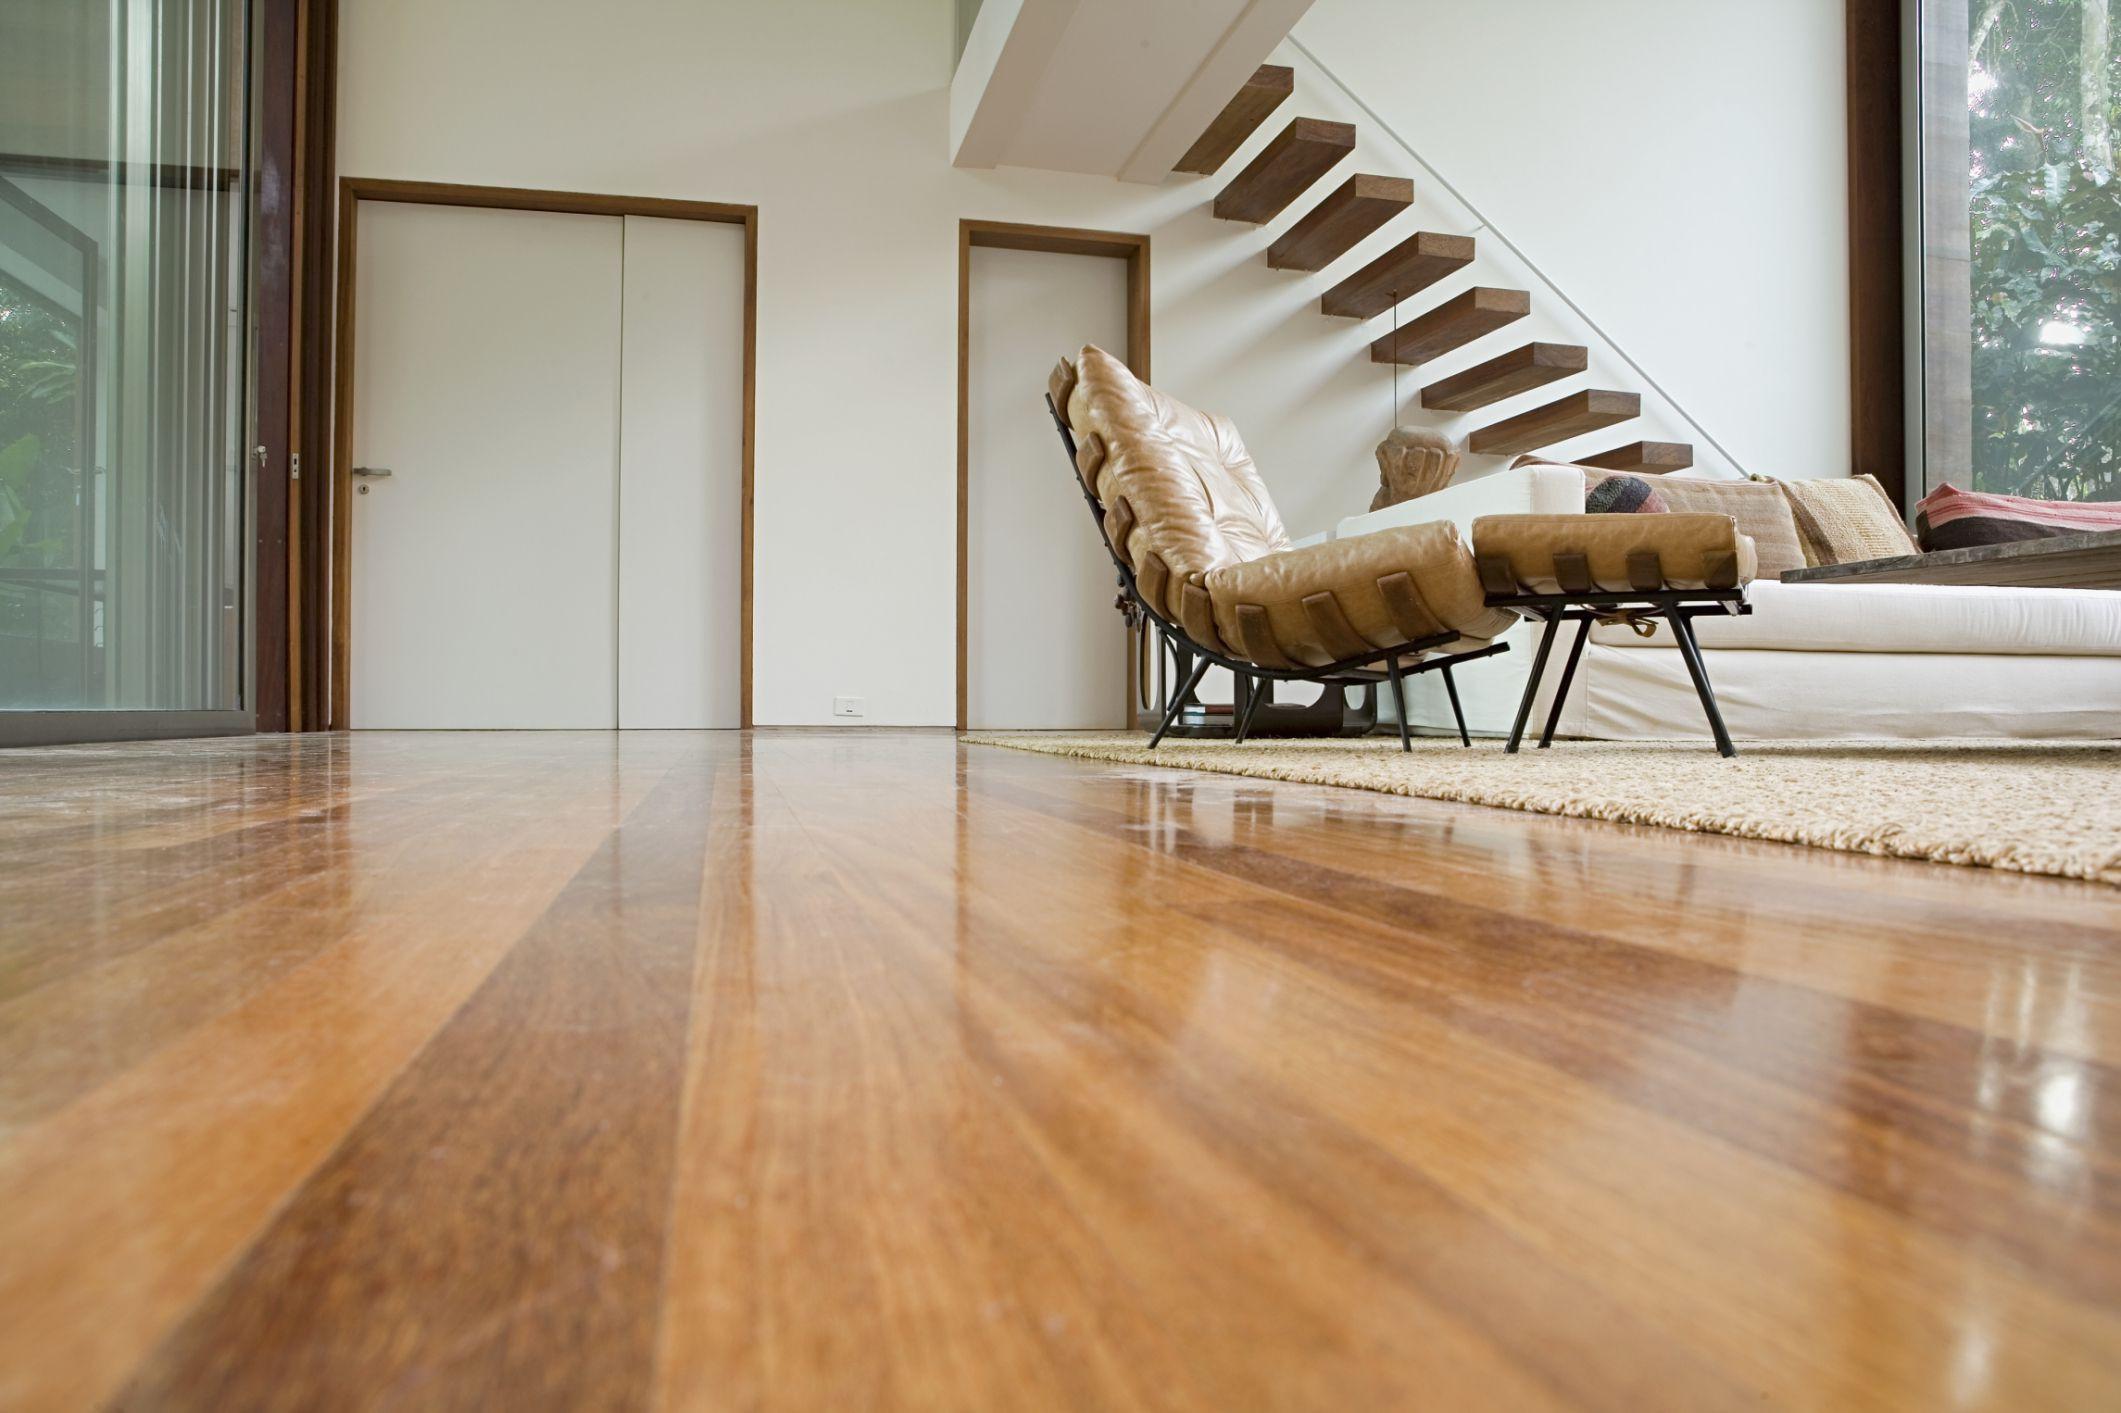 2 1 4 oak hardwood flooring of engineered wood flooring vs solid wood flooring in 200571260 001 highres 56a49dec5f9b58b7d0d7dc1e